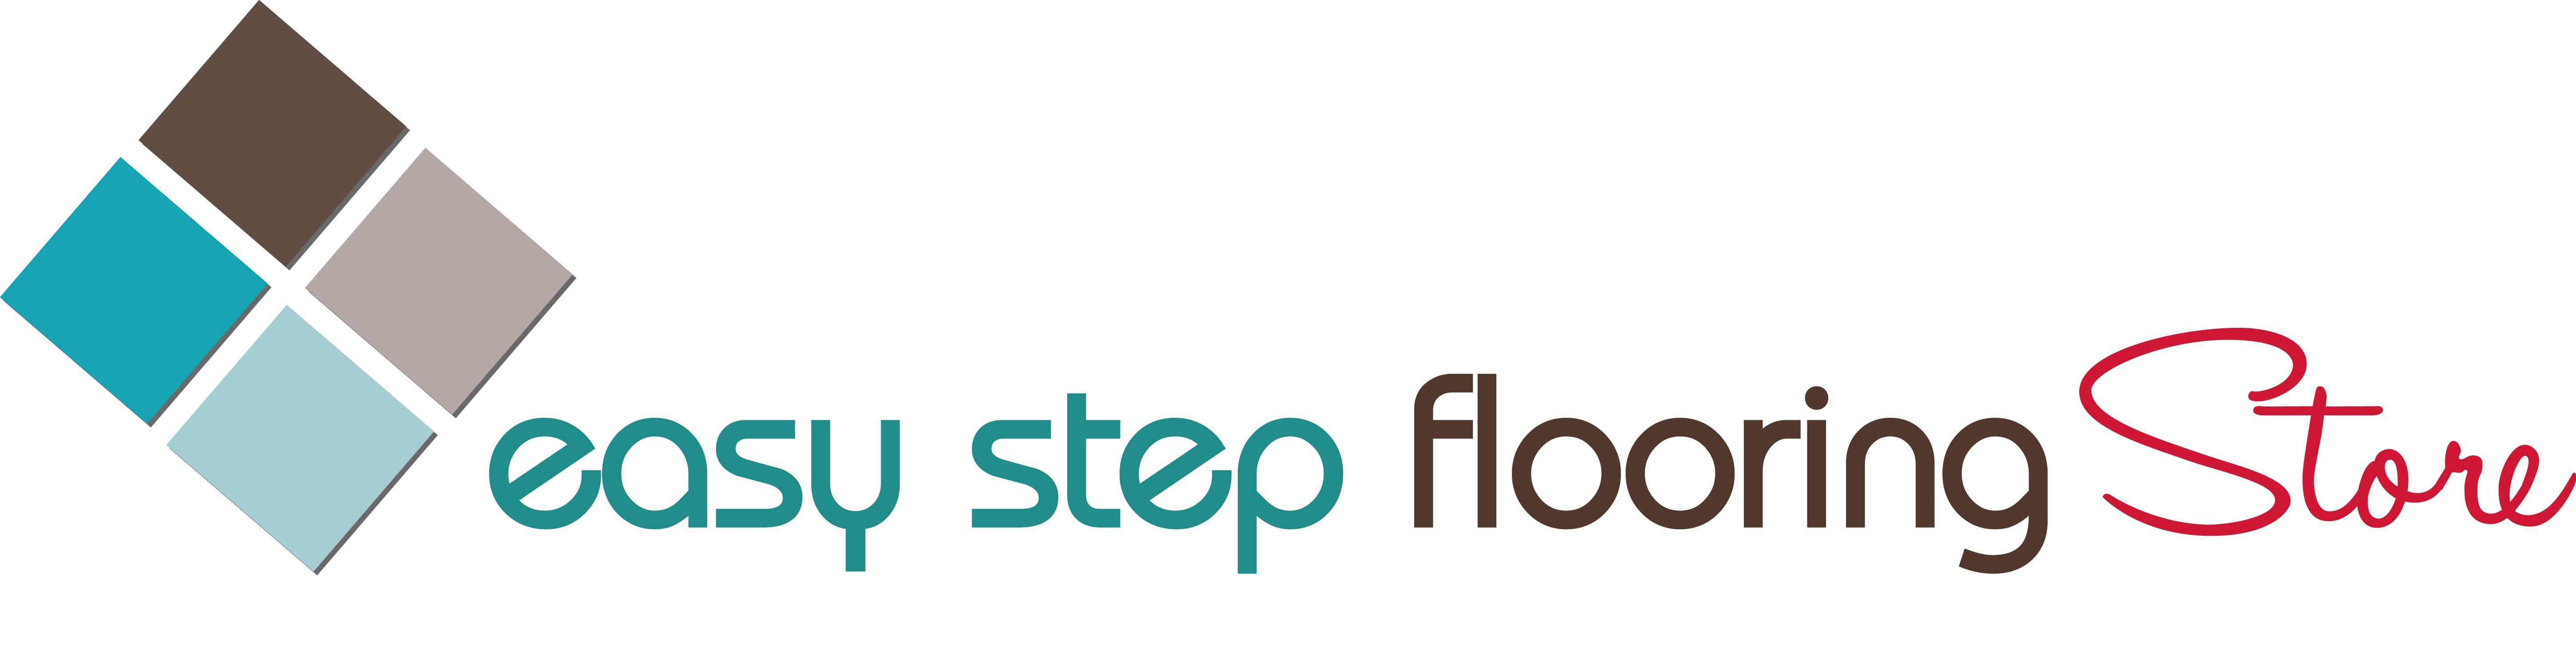 Easy Step Flooring